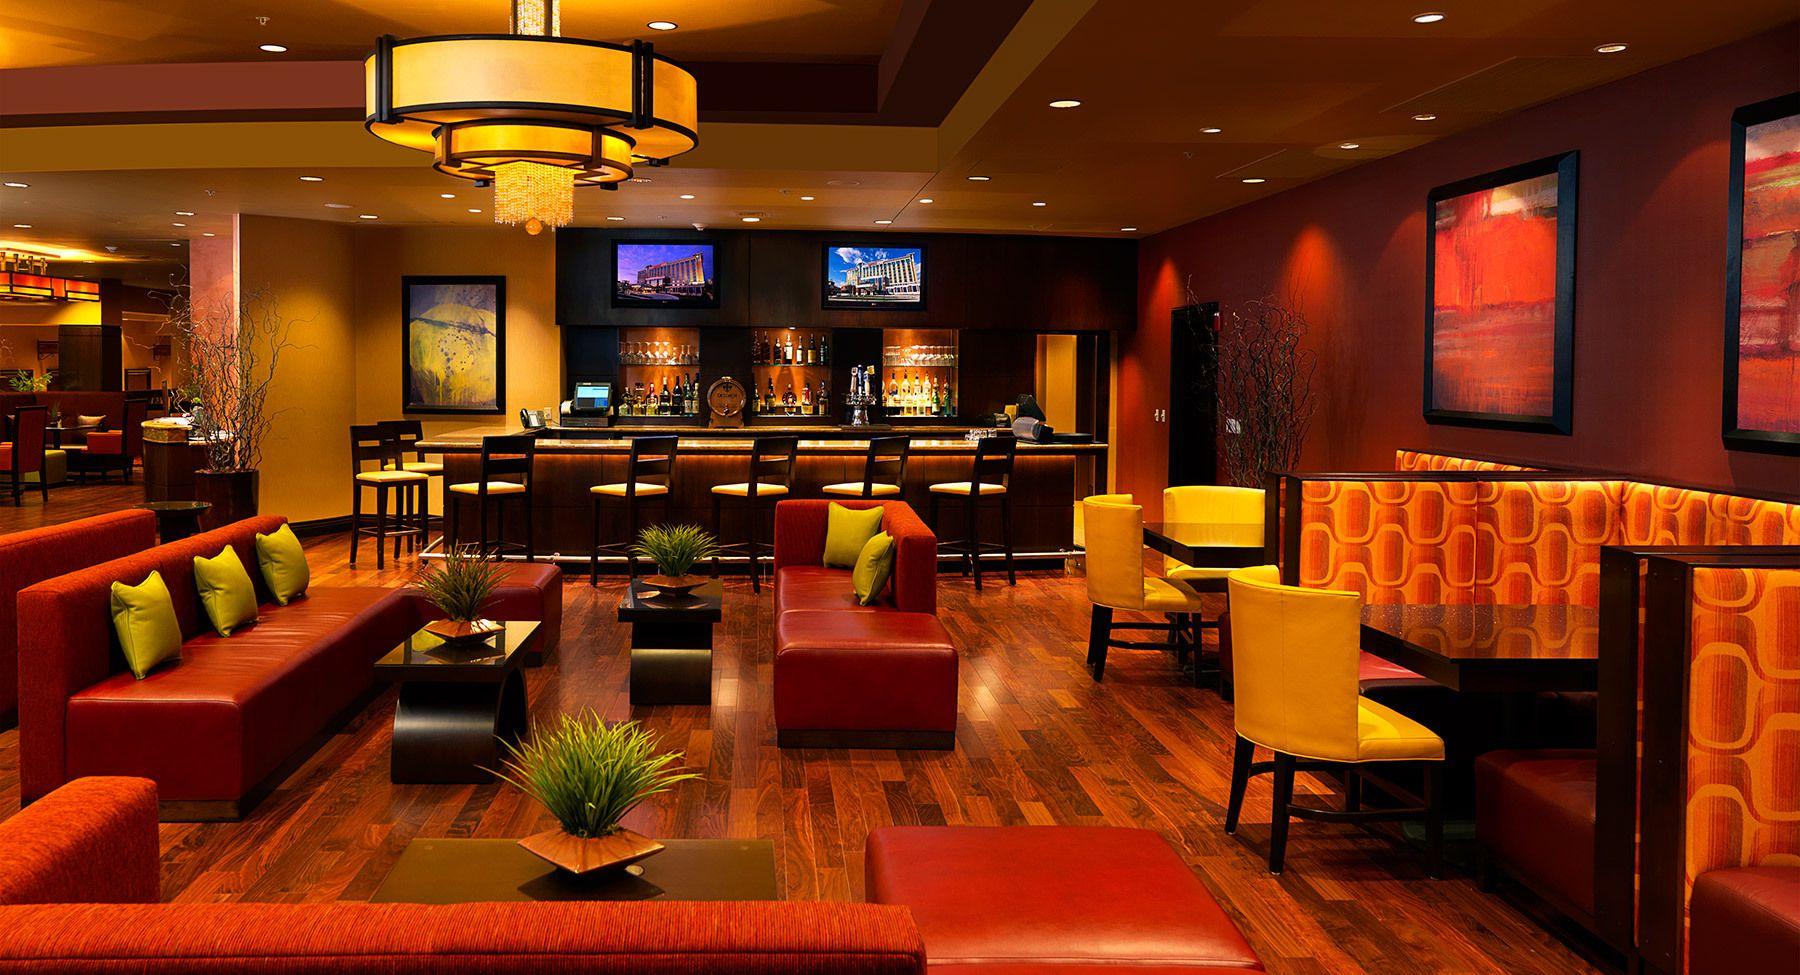 1marriott_bar_lounge__0001rcg_300_18x975